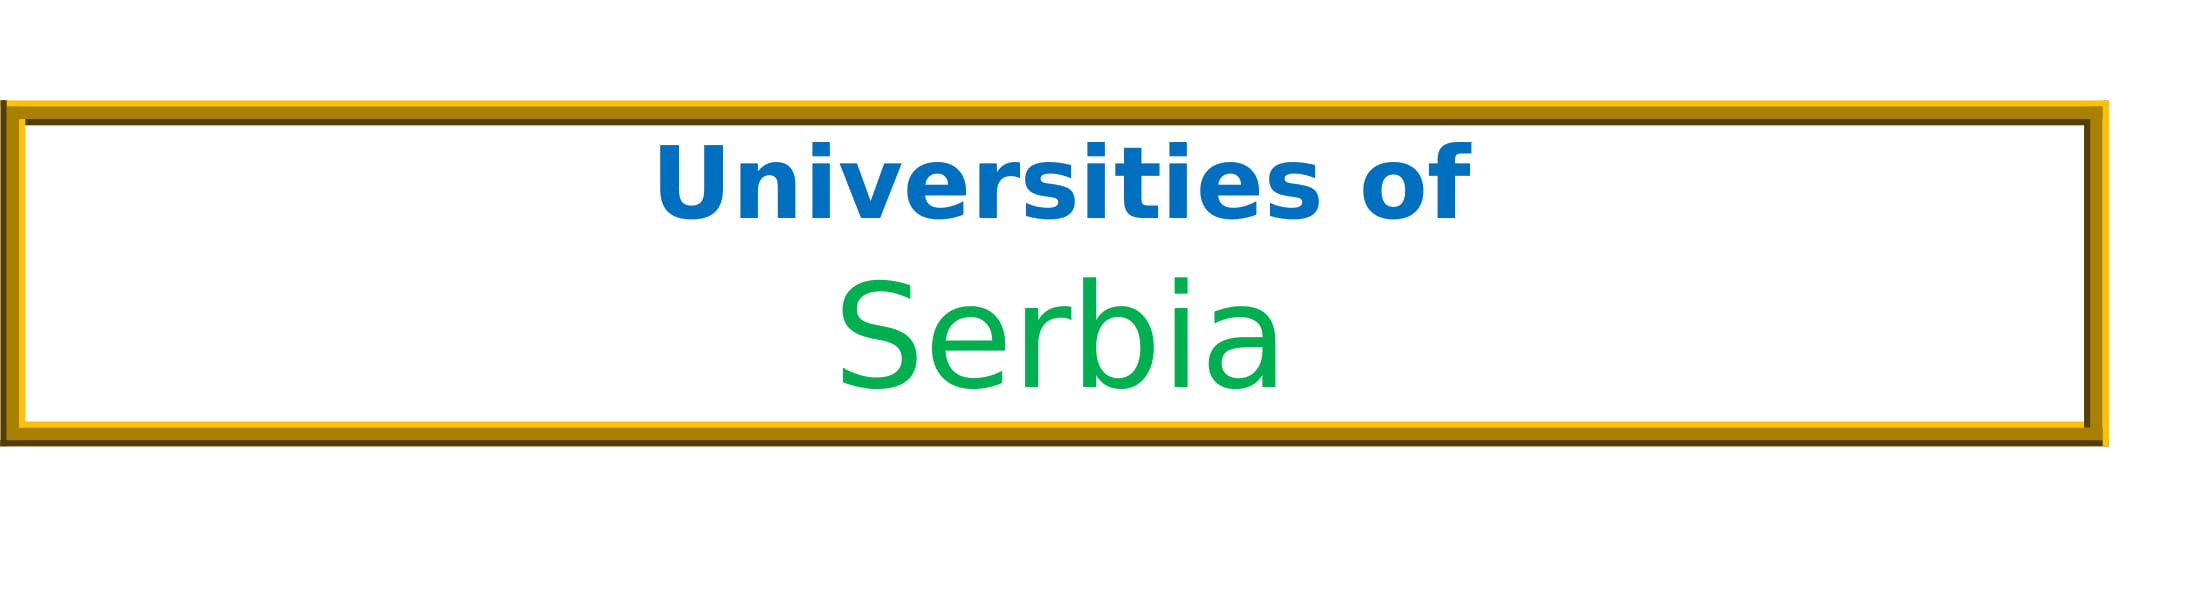 List of Universities in Serbia